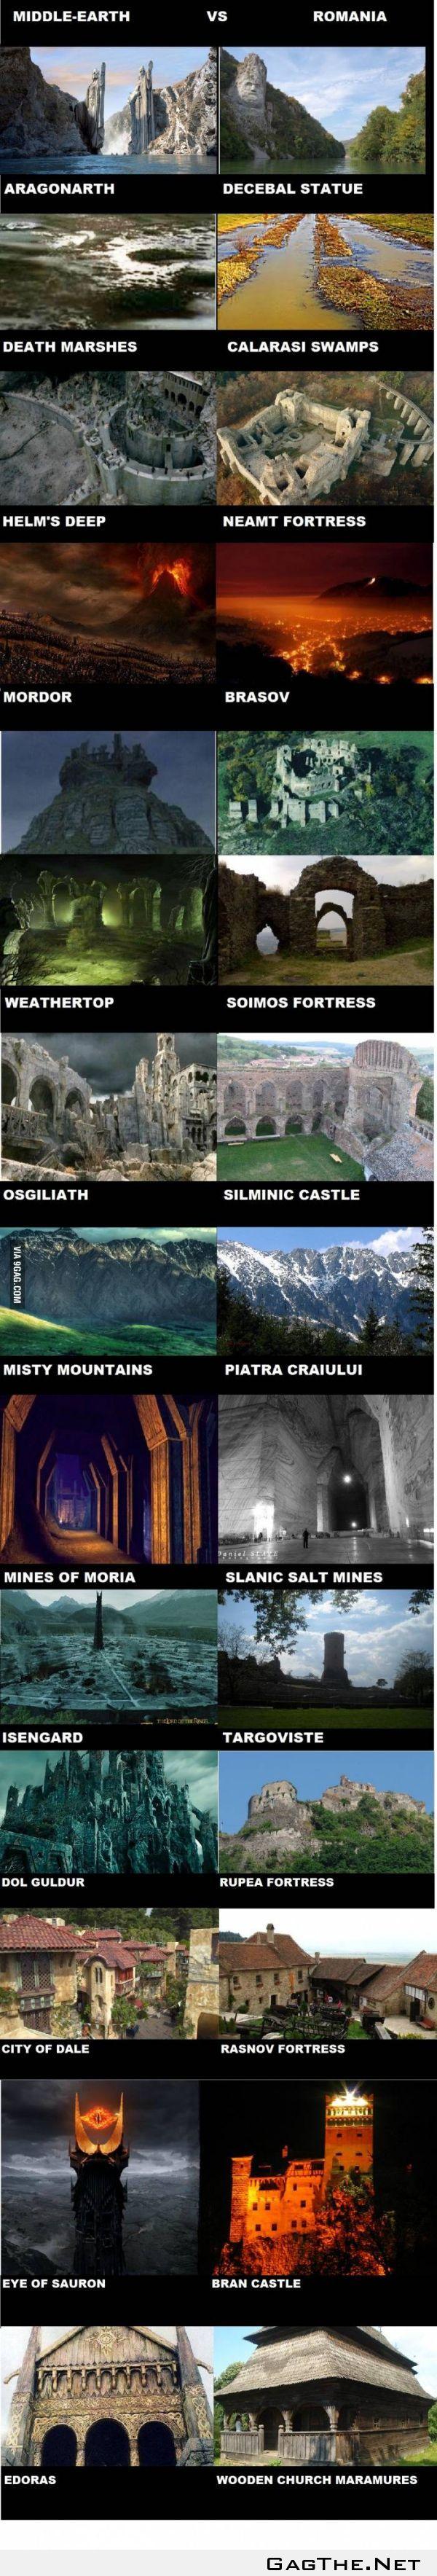 Middle-Earth-vs-Romania-wallpaper-wp5209329